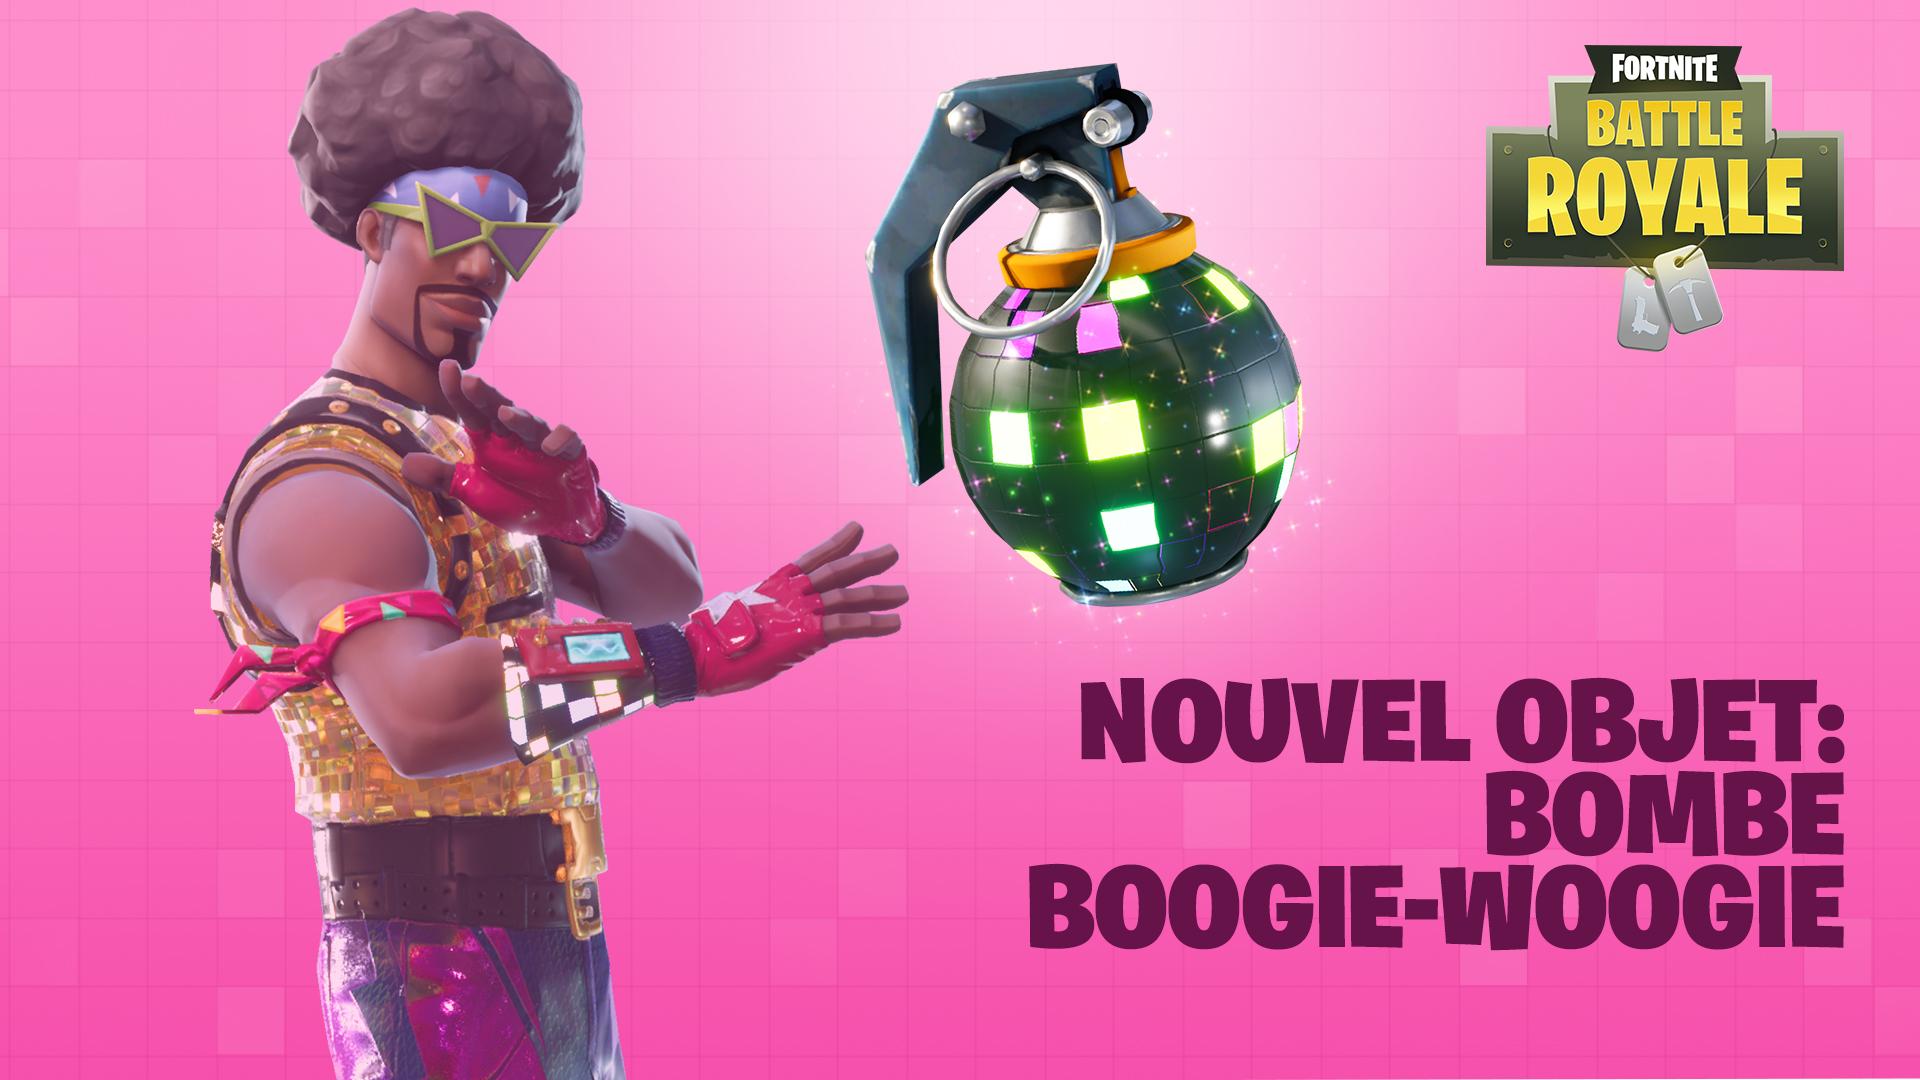 FR_BoogieBomb_YT_Thumb.jpg